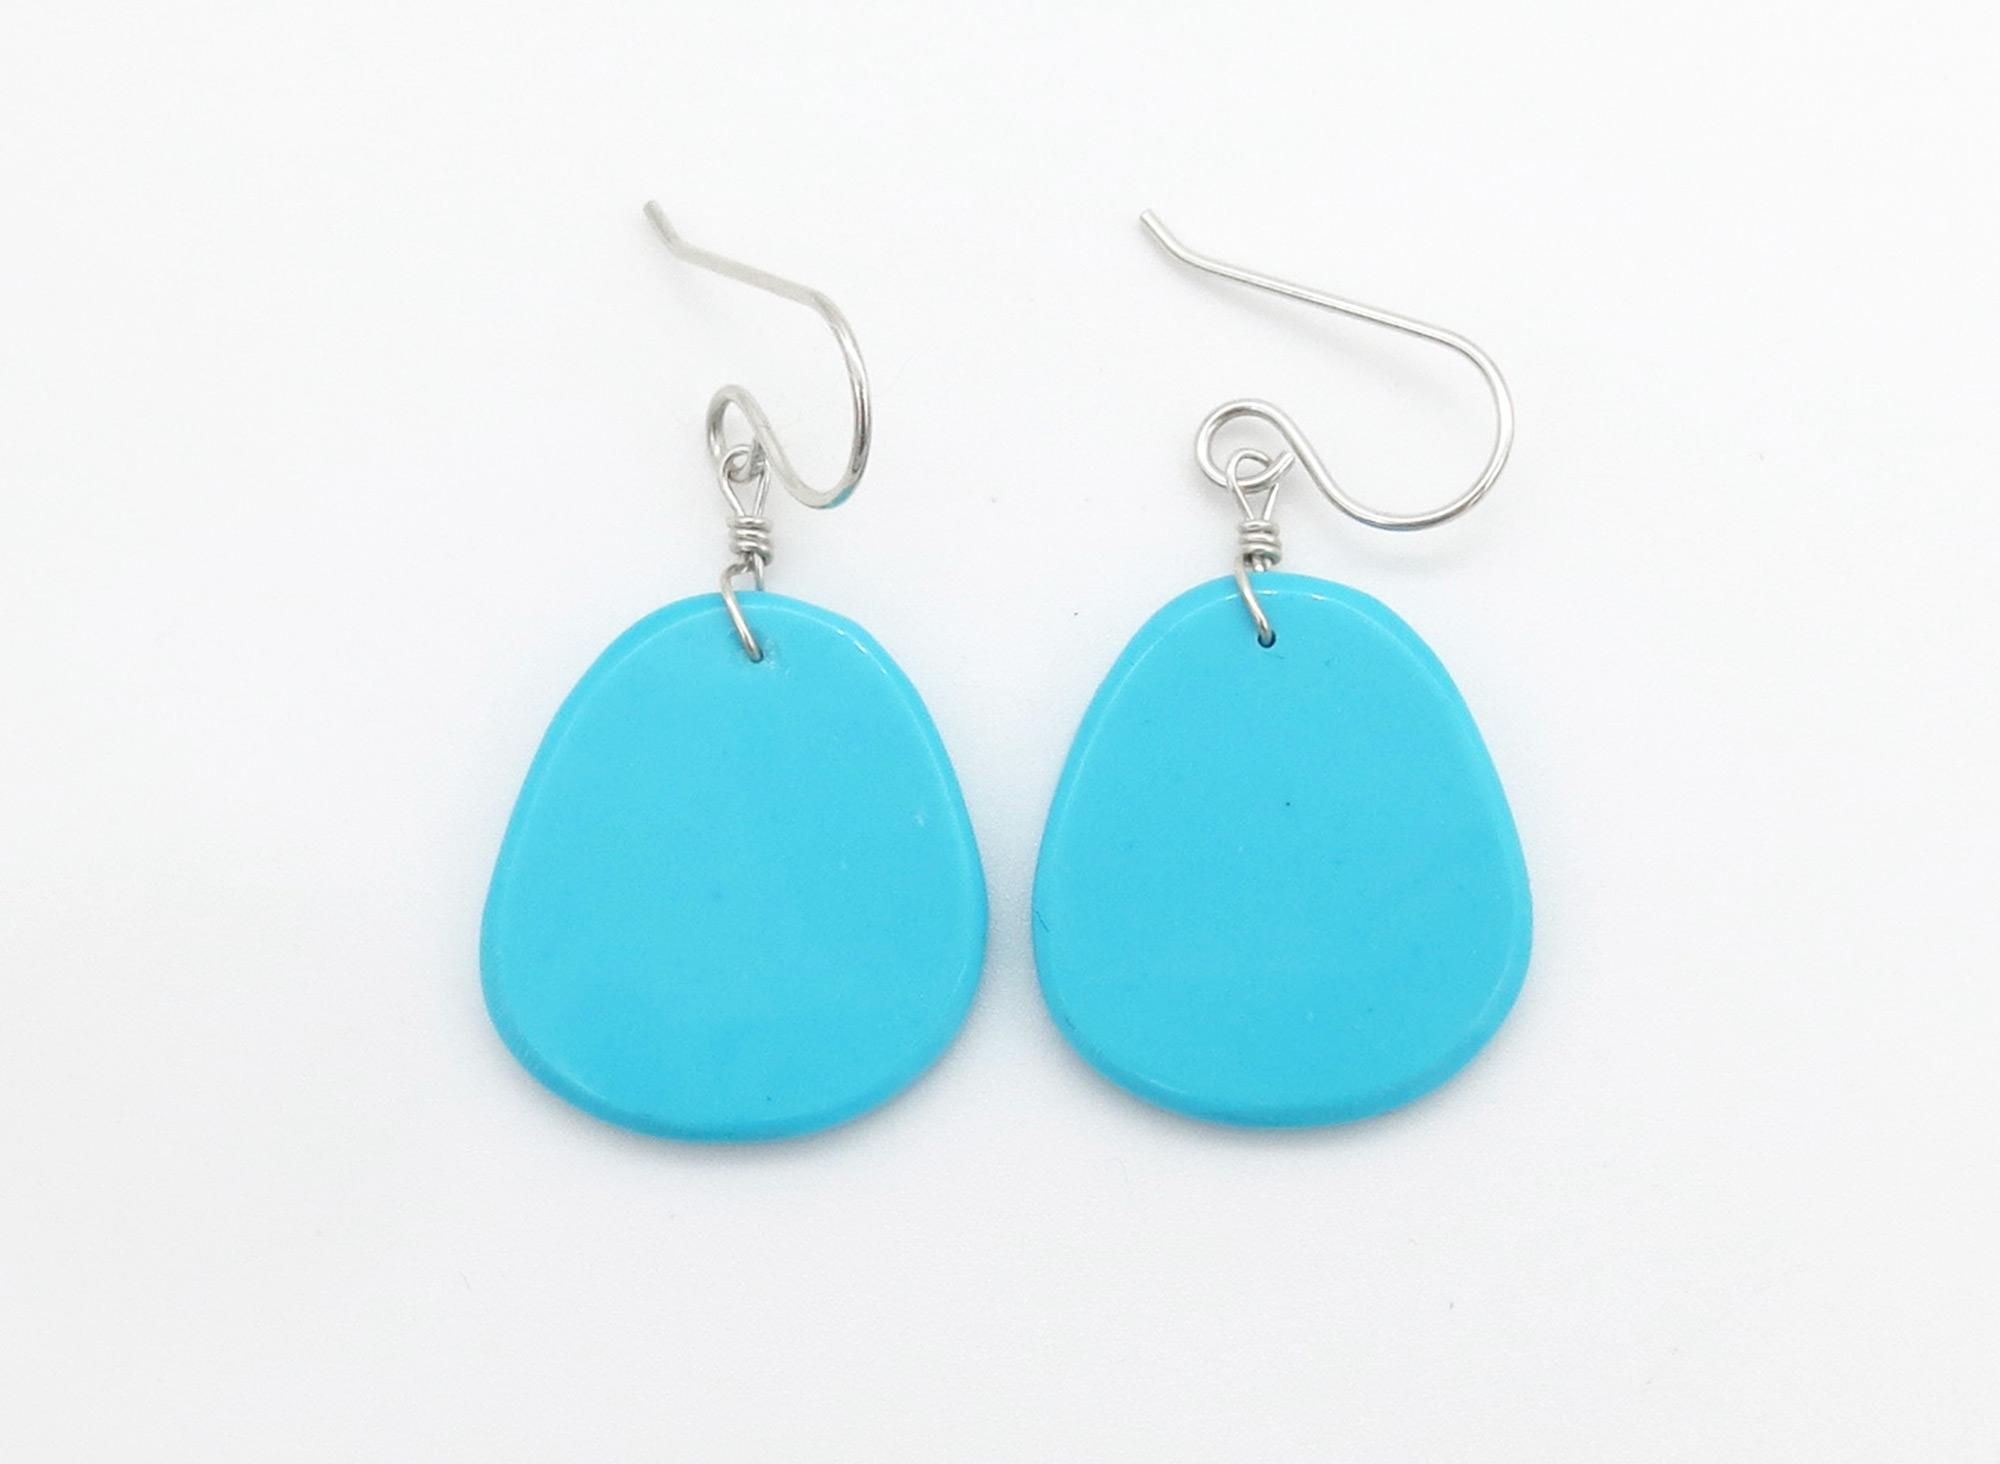 Turquoise Slab Earrings Santo Domingo - 6259pl